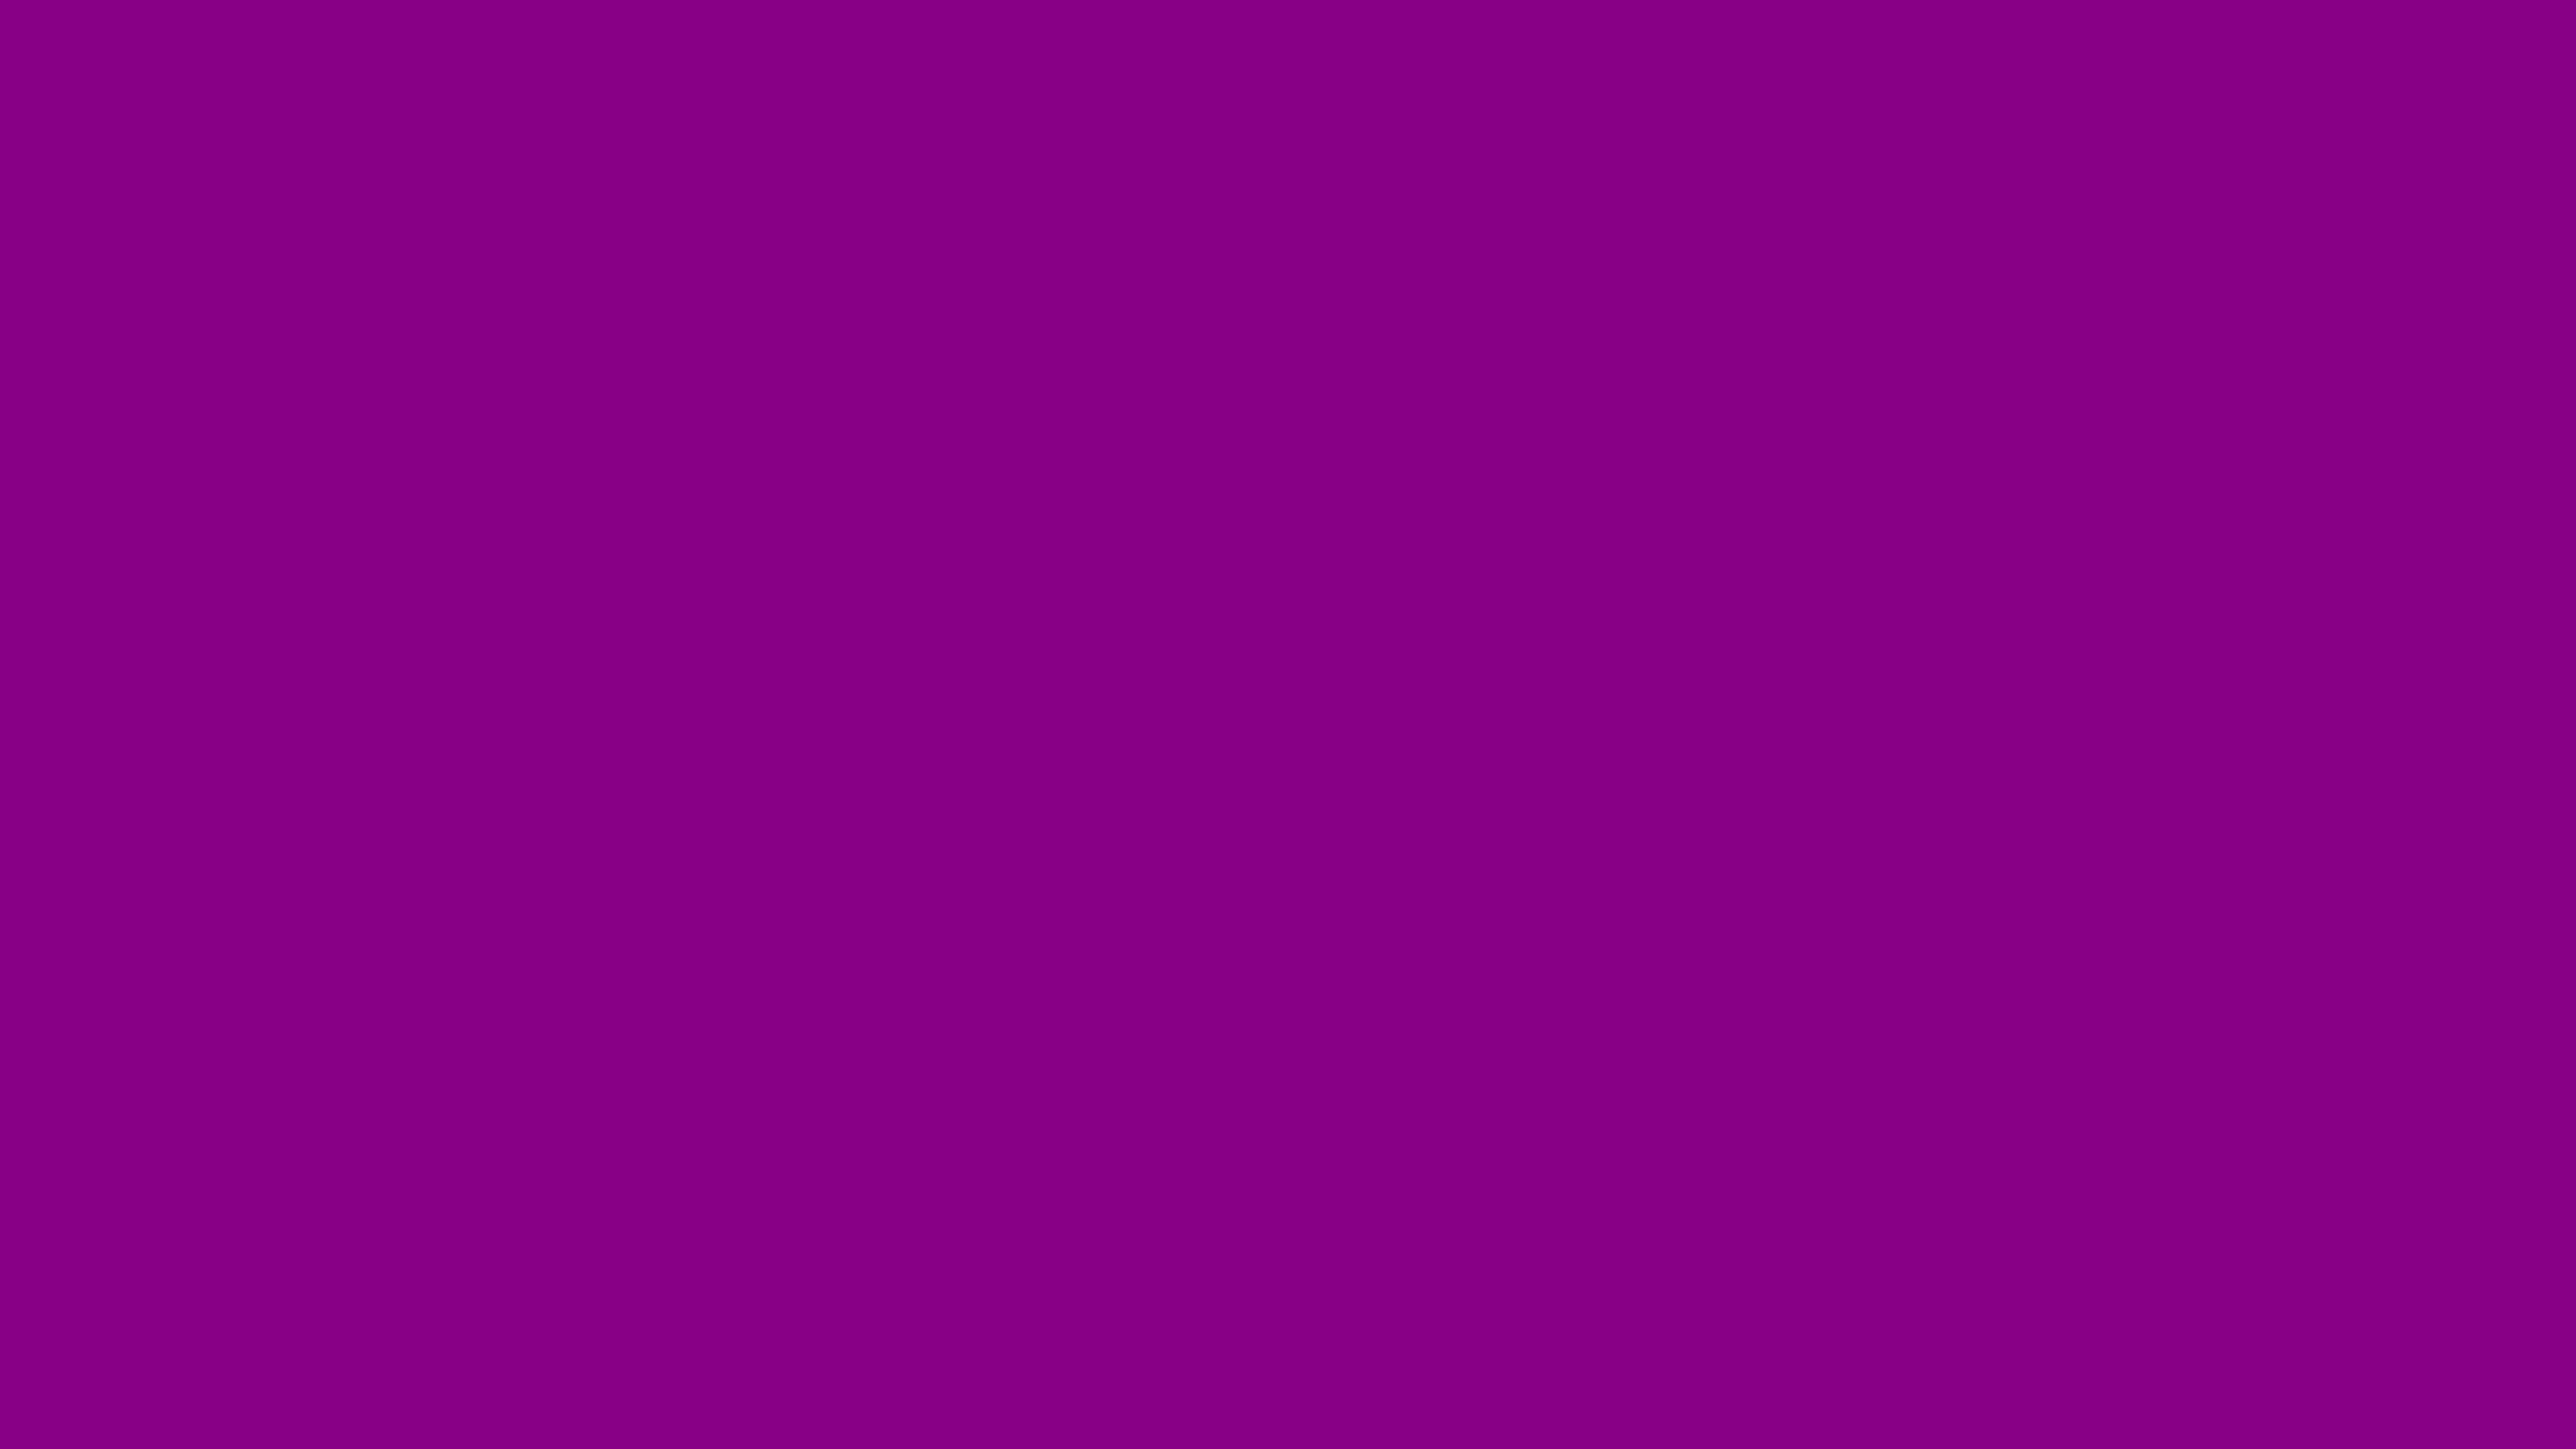 4096x2304 Mardi Gras Solid Color Background